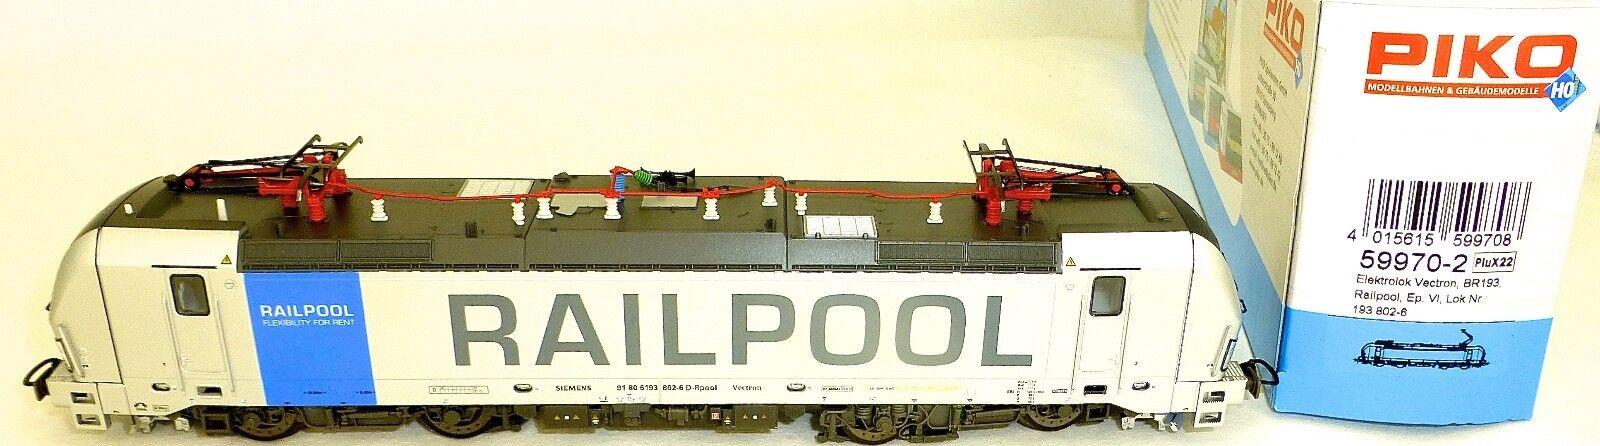 Br 193 802-6 ellok VECTRON Railpool epVI Plux22 PIKO 59970-2 H0 1 87